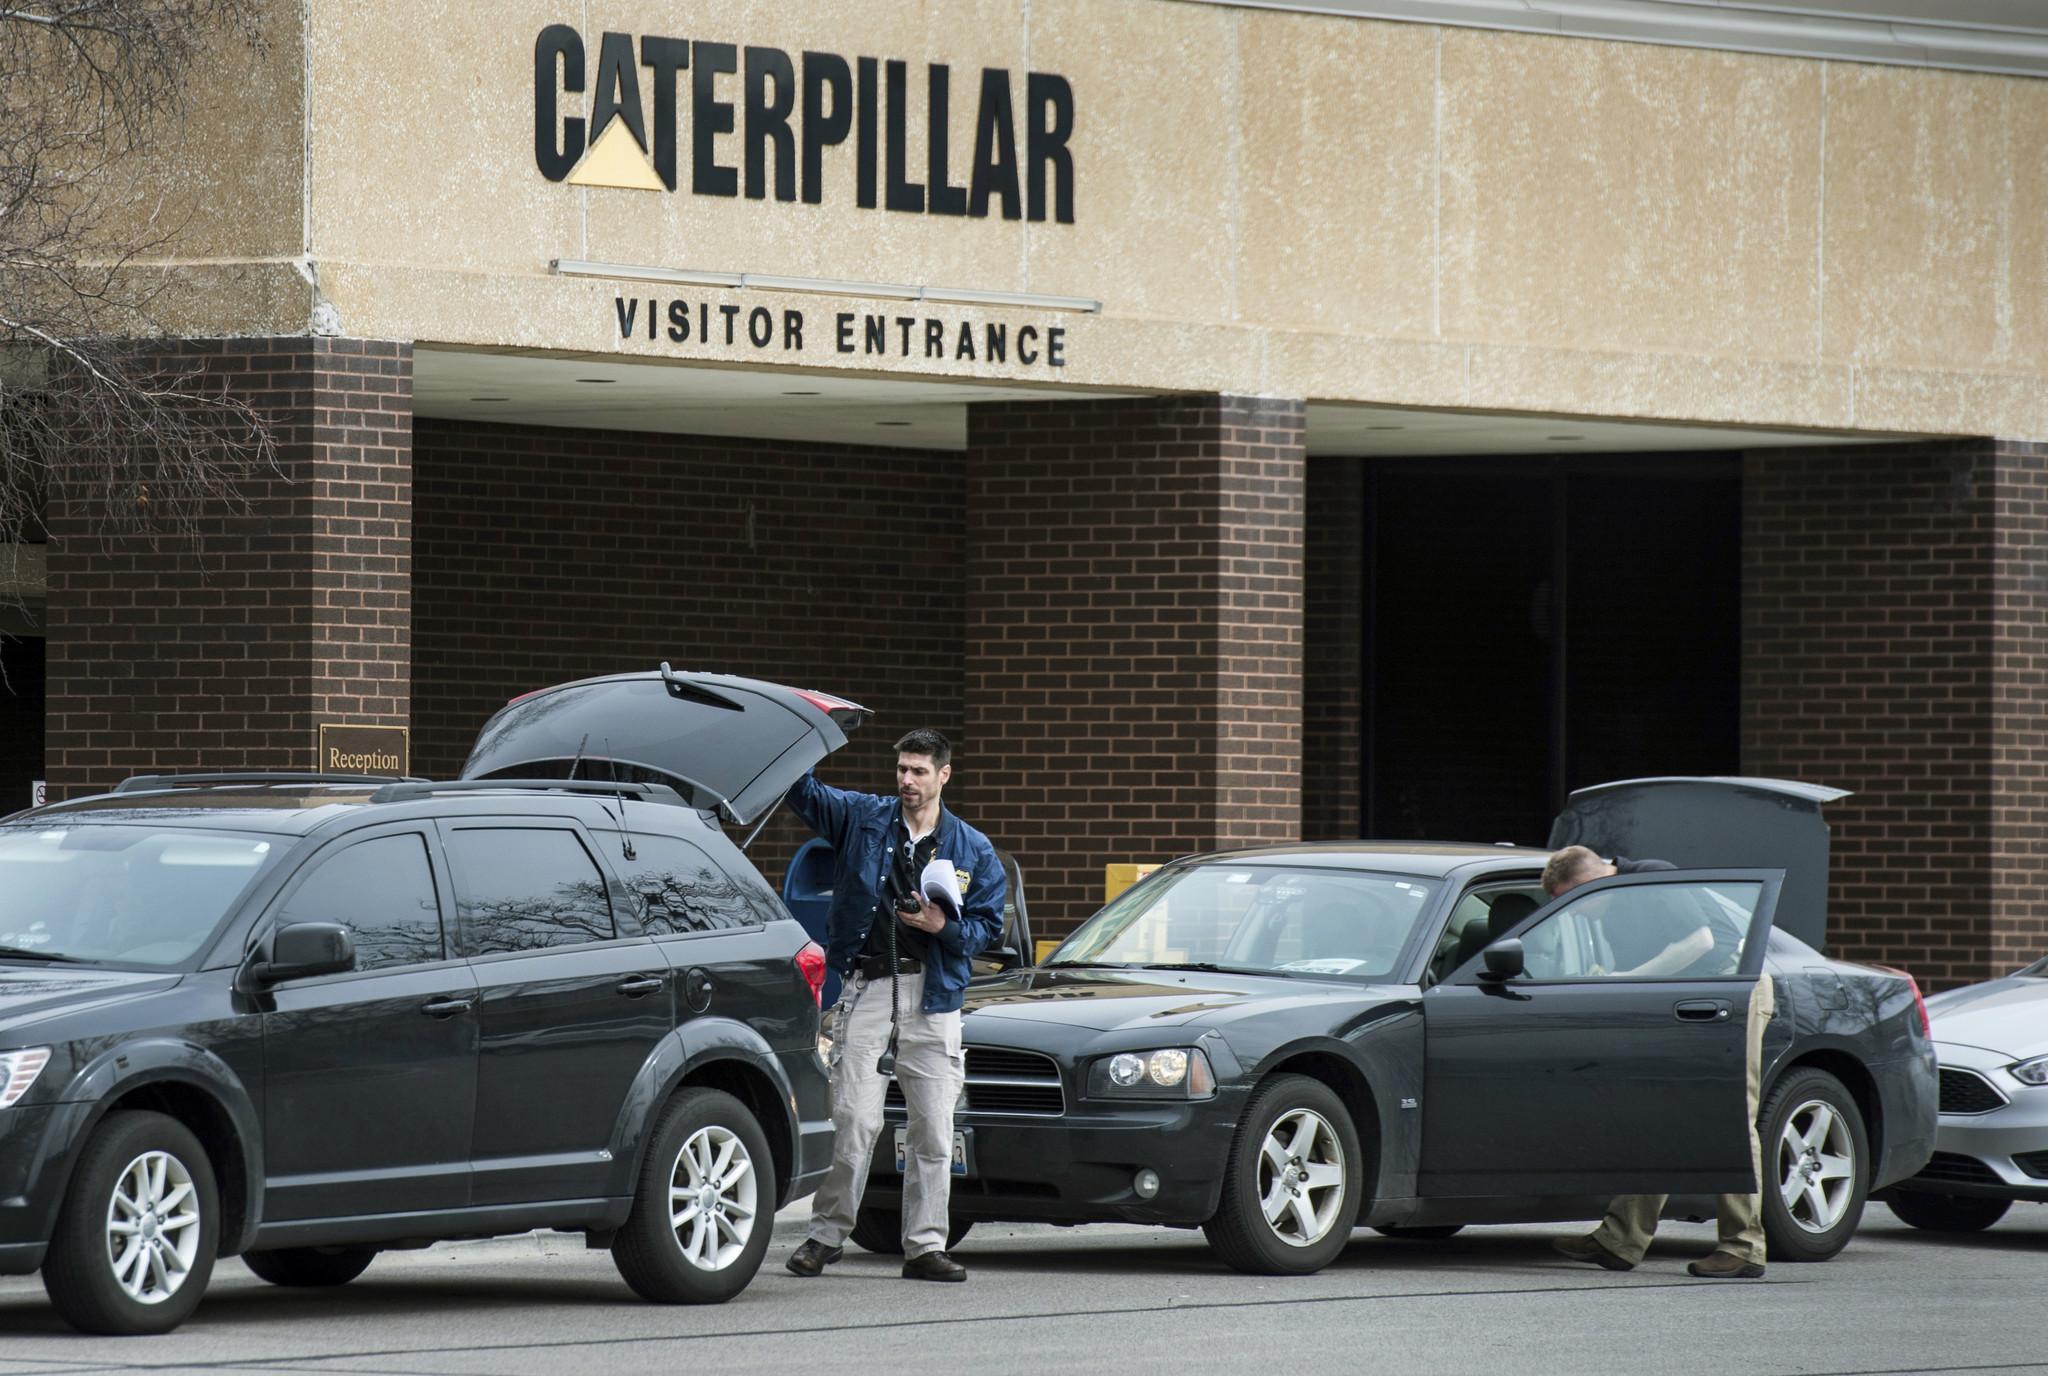 In Wake Of Fed Raids Caterpillar Denies Skirting Tax Laws Chicago